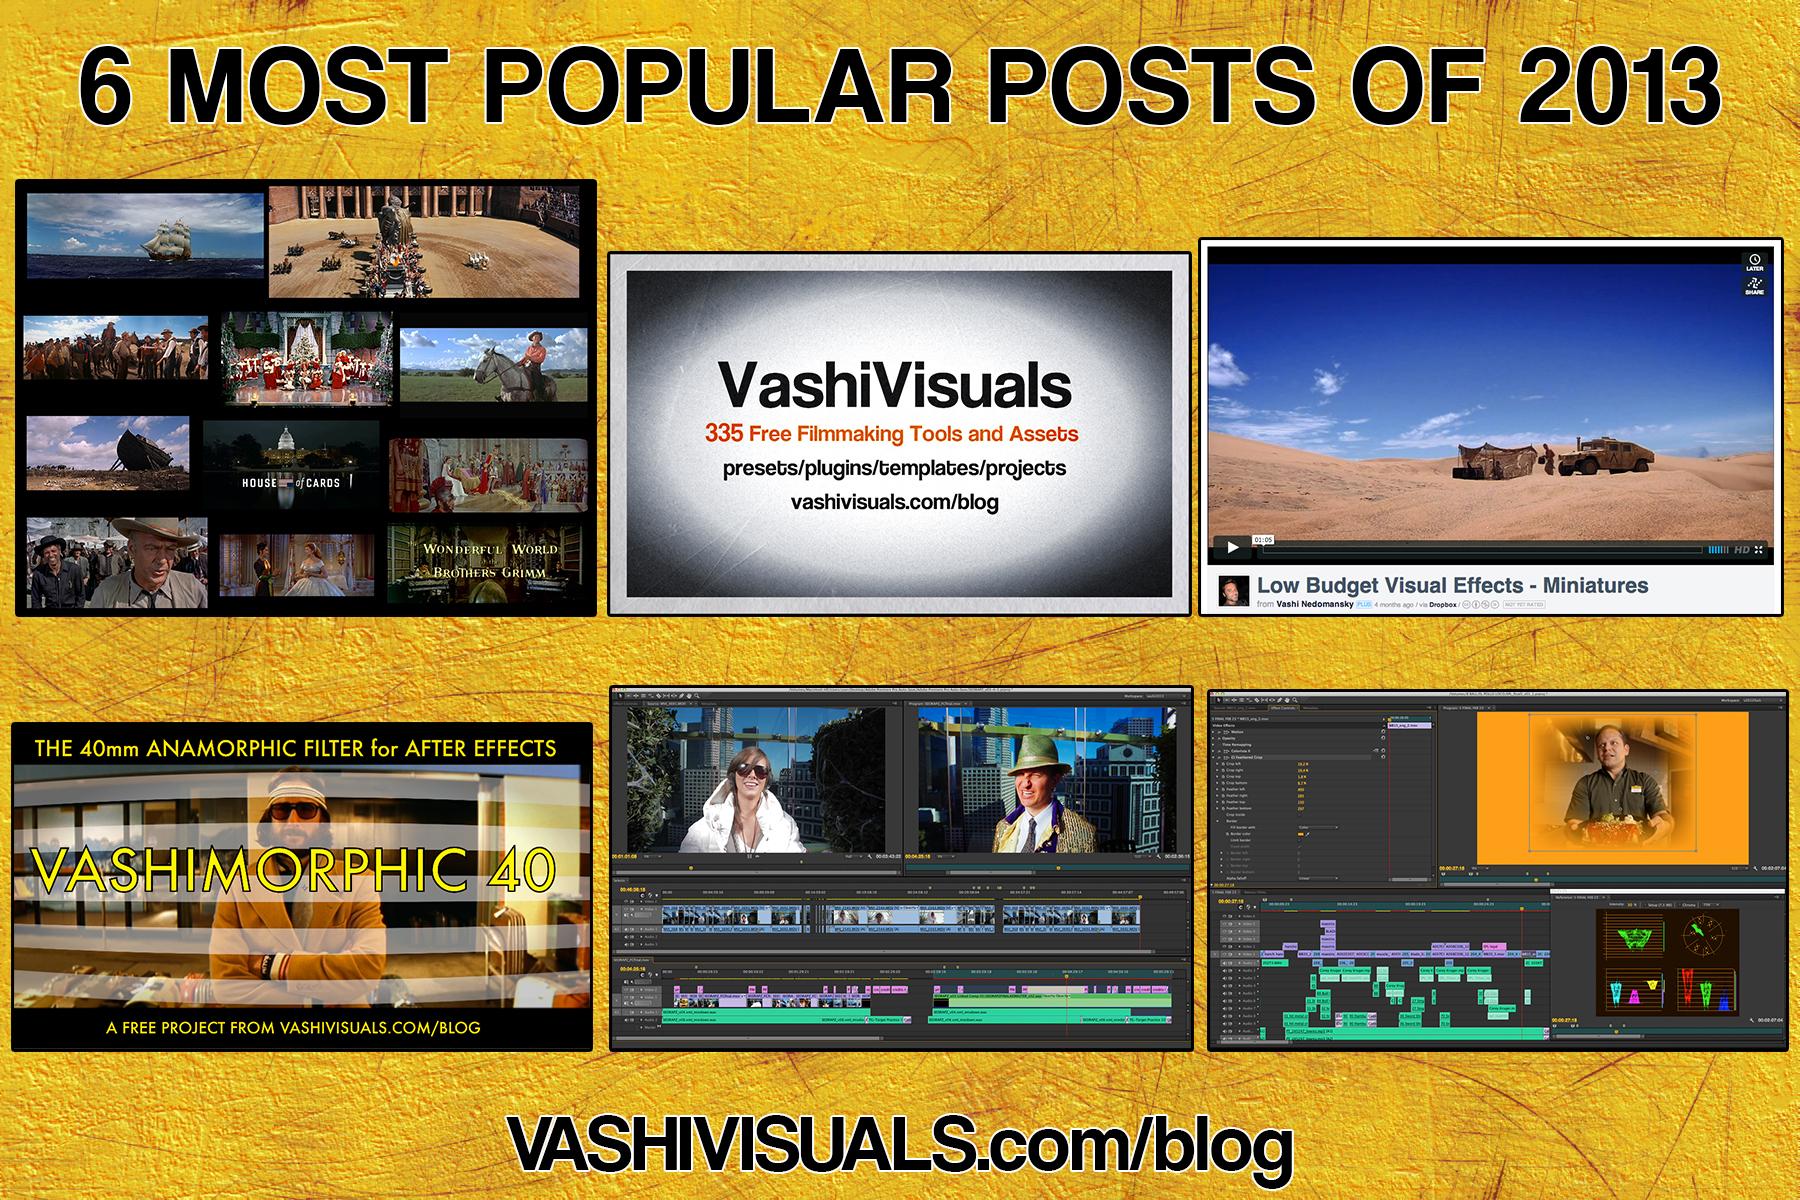 6 most popular posts of 2013 on VashiVisuals Blog